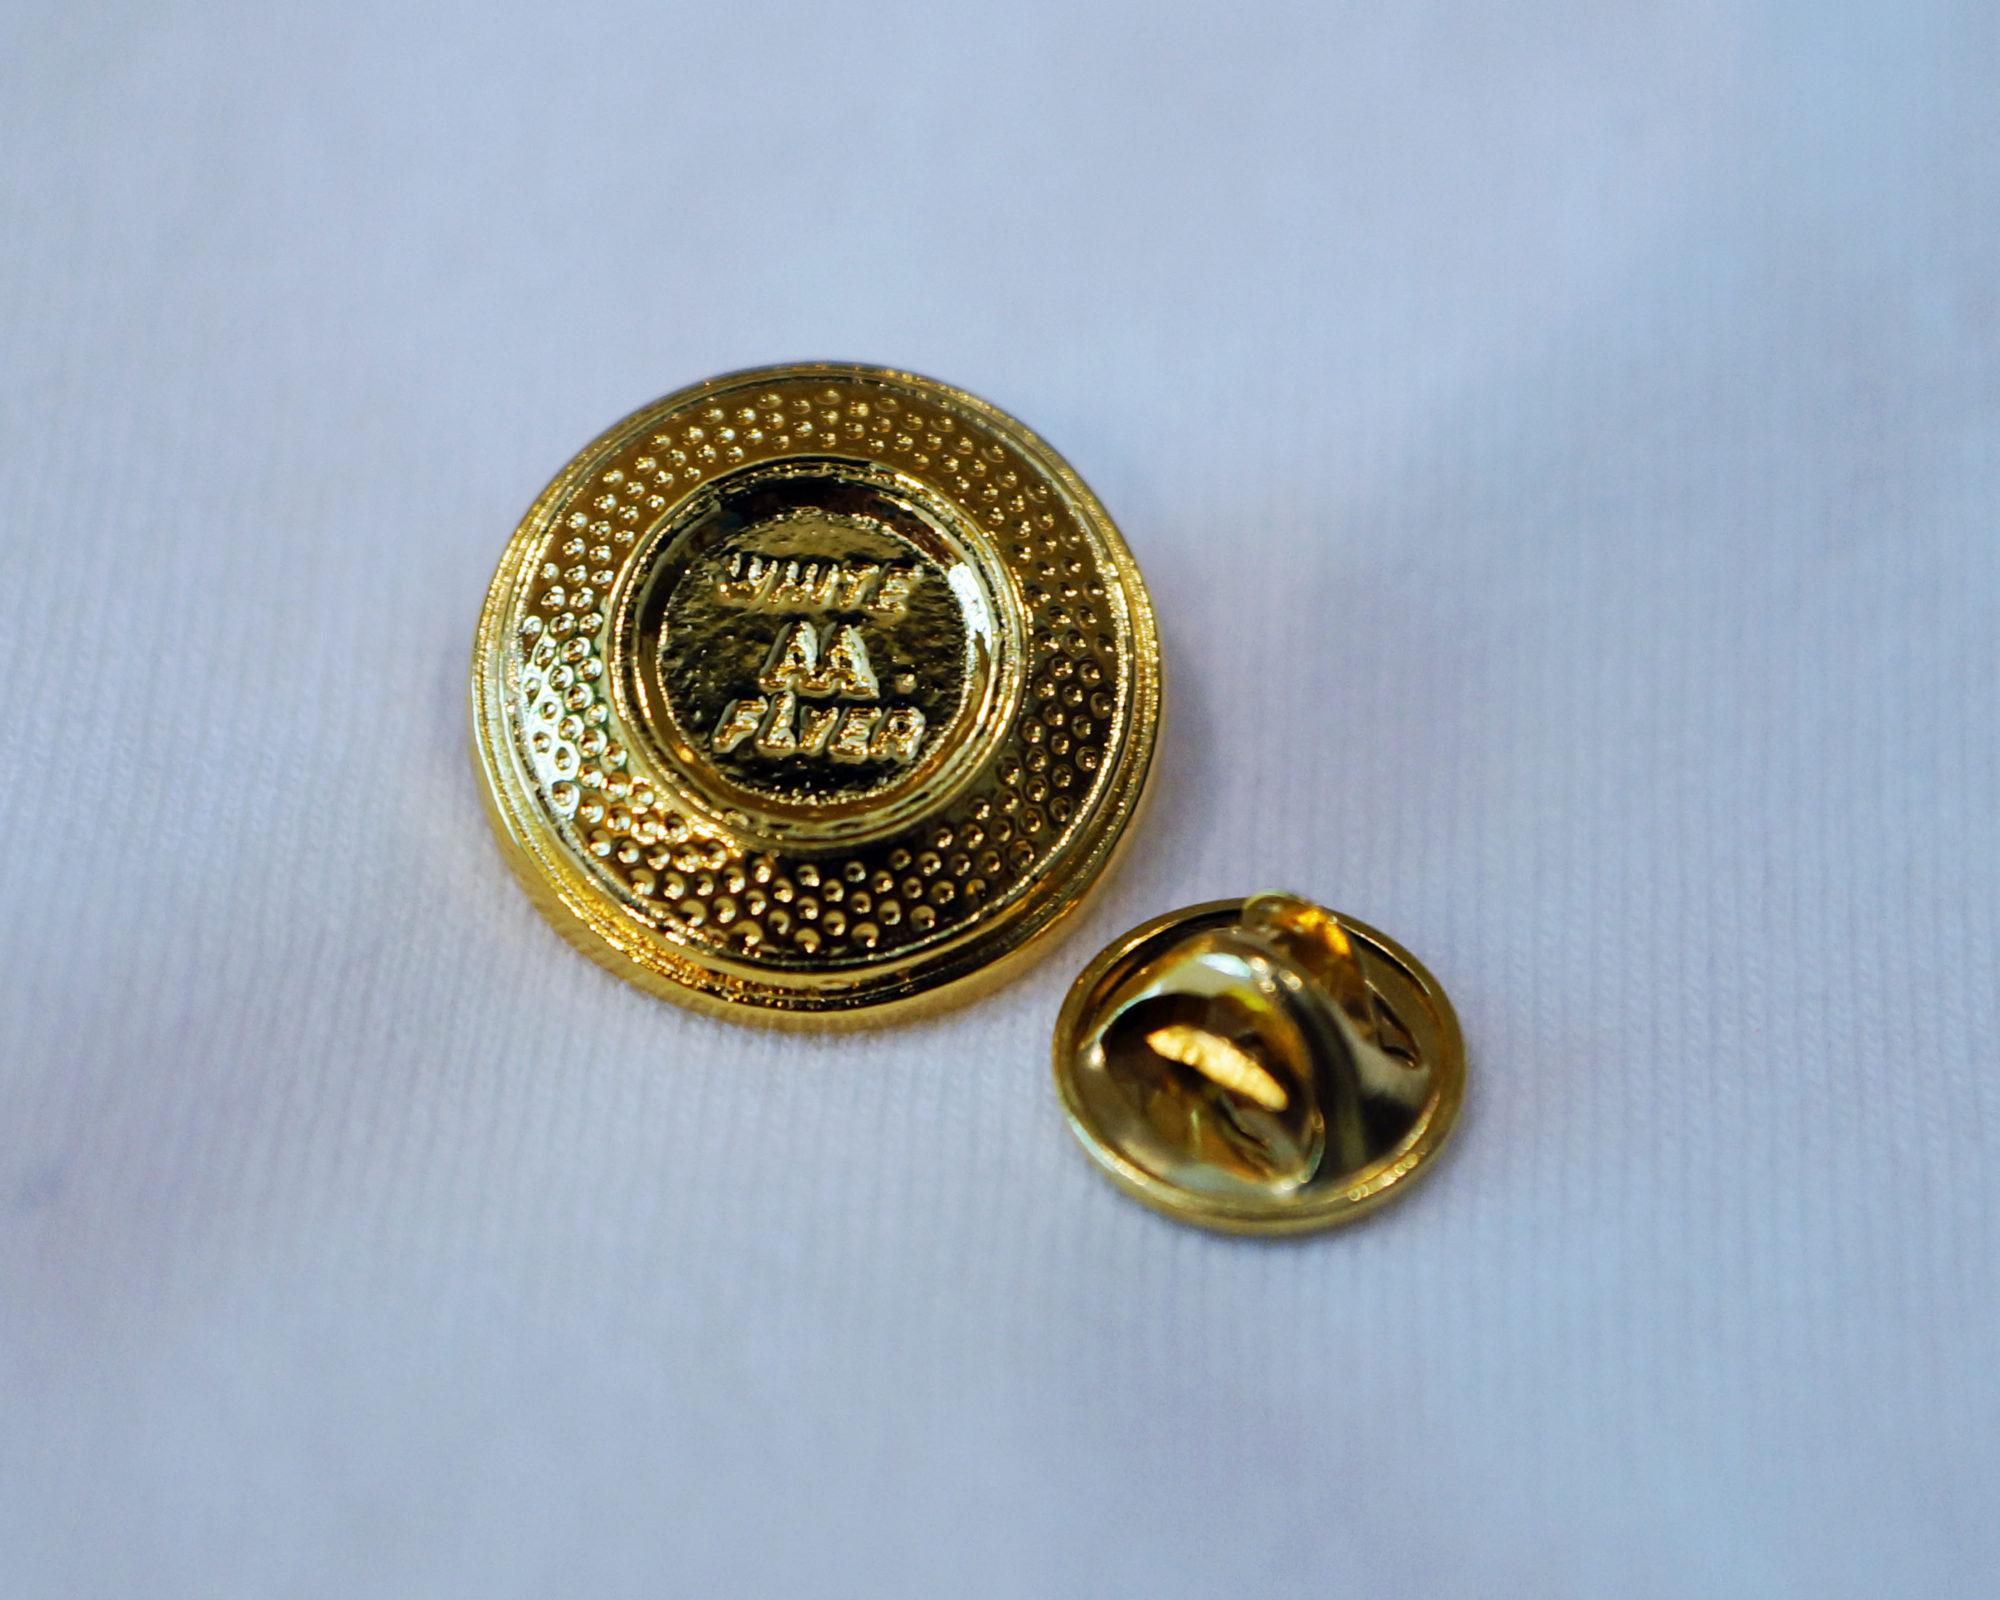 ec180b2d3cb Gold Target Pin   White Flyer American Trap, Skeet, International ...